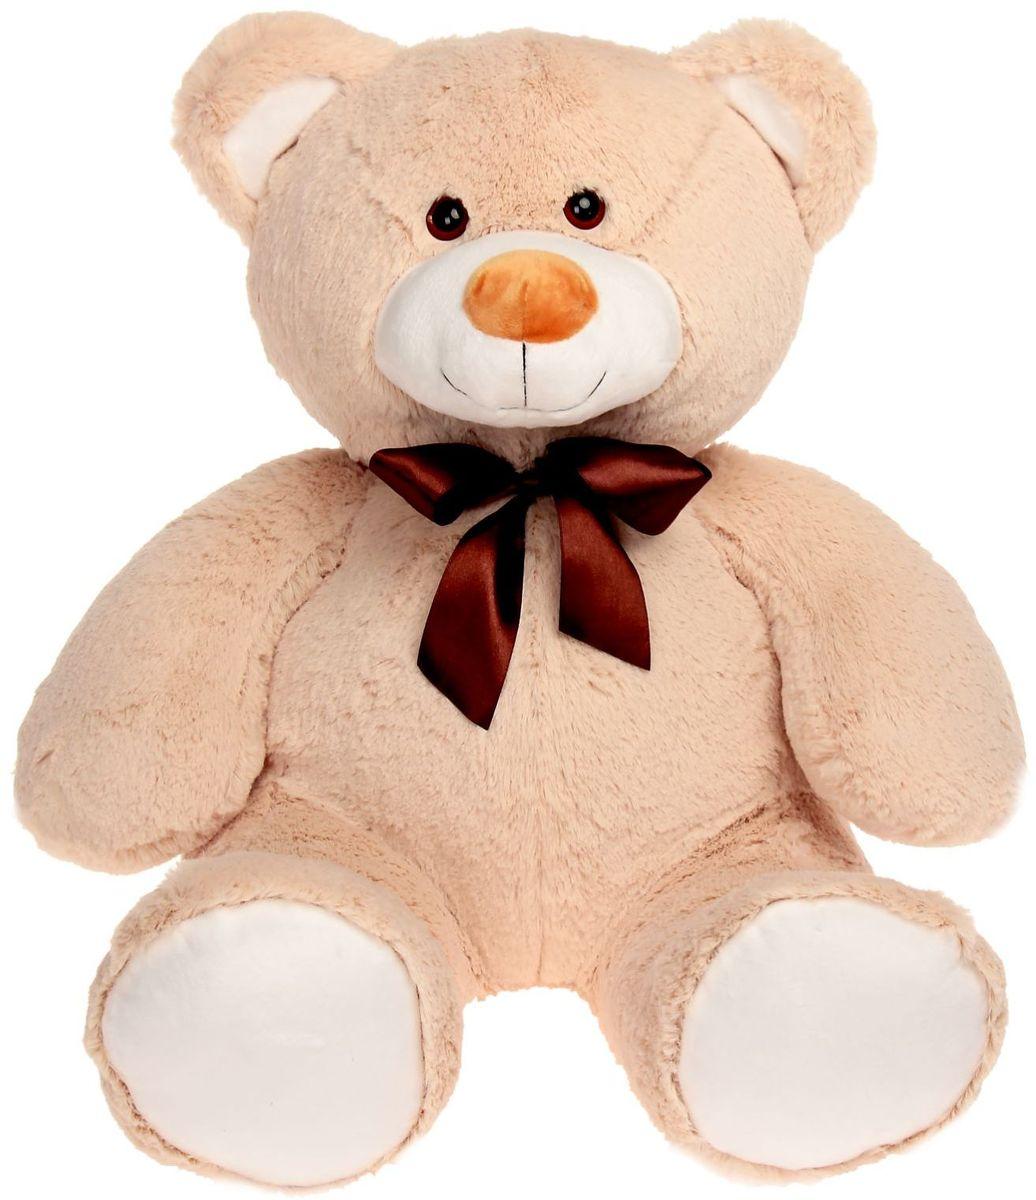 Zakazat.ru Princess Love Мягкая игрушка Мишка Рон цвет бежевый 70 см 2057692